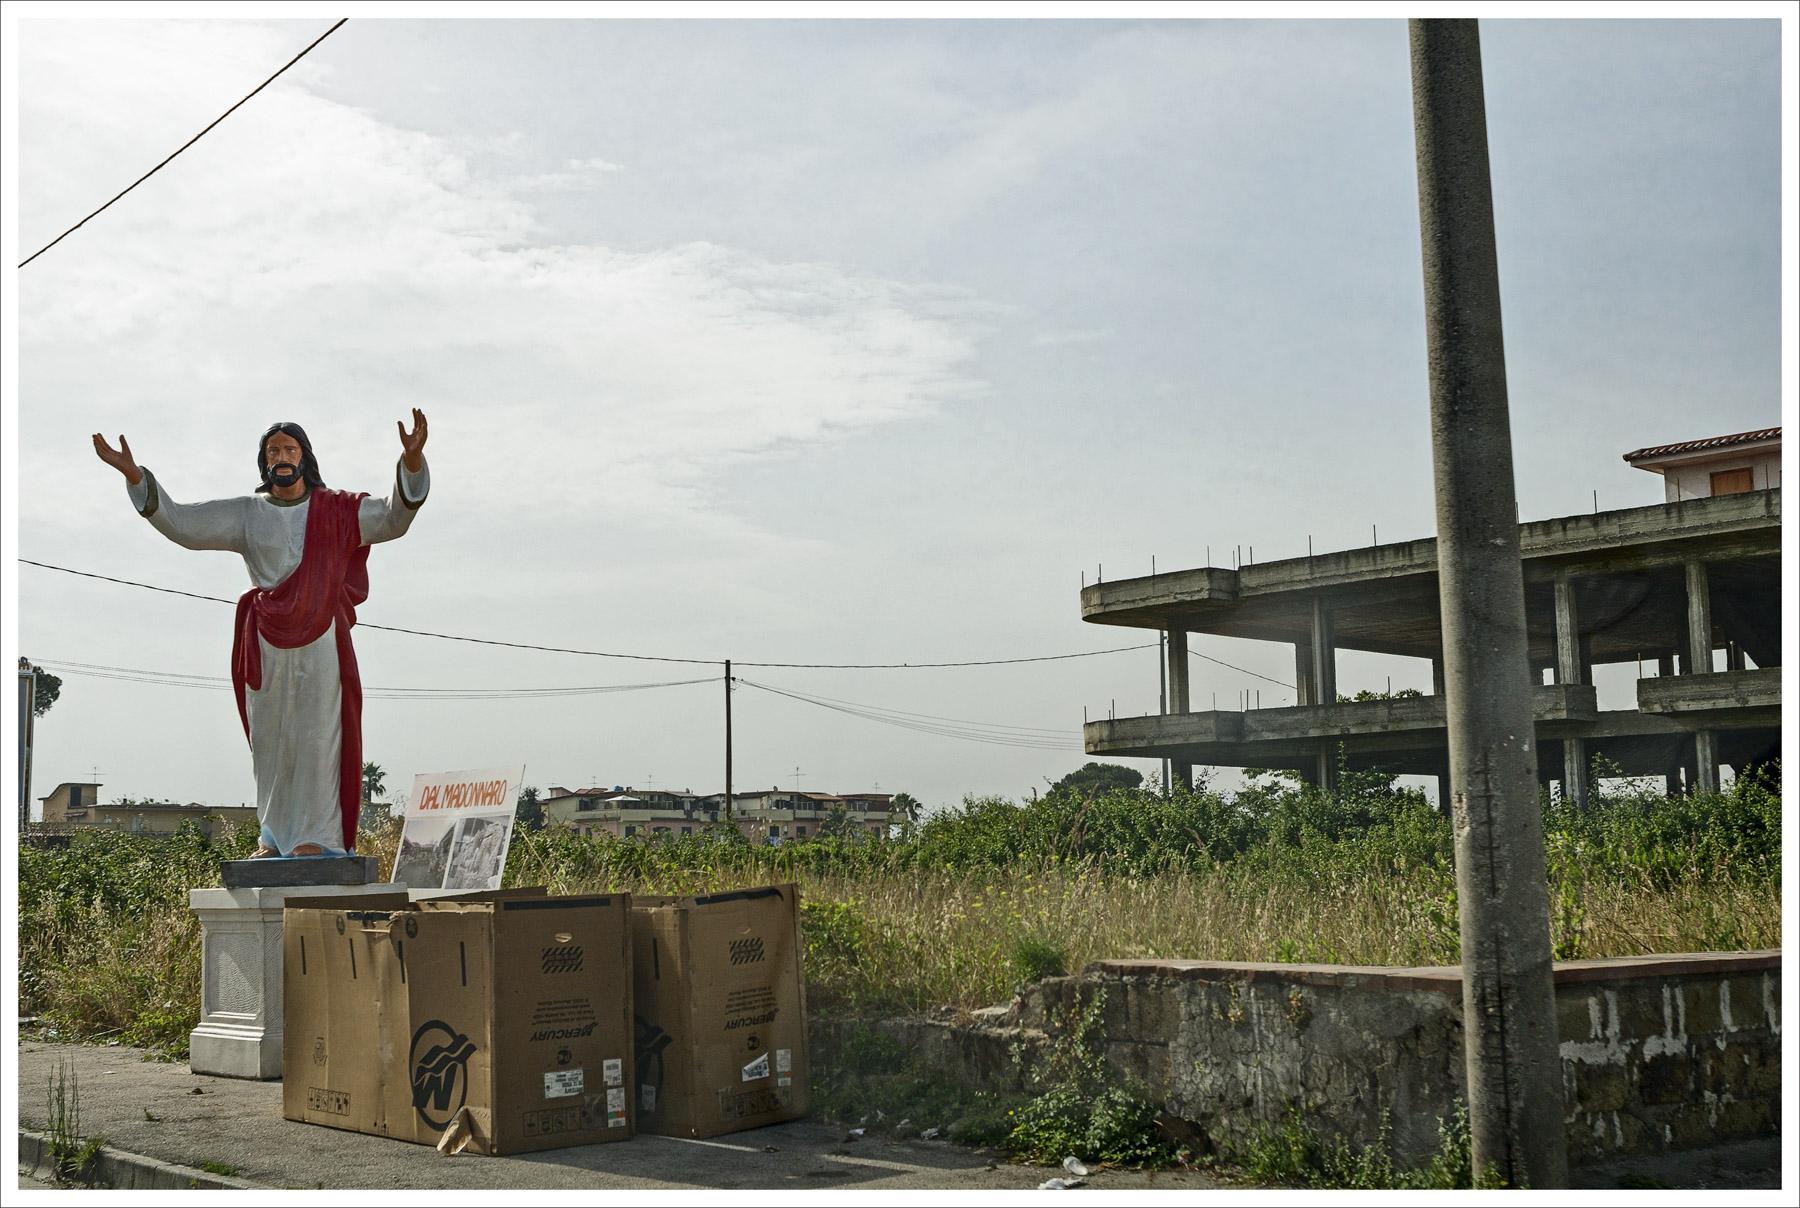 Saluti-da-PINETAMARE-09-DSC1562.jpg